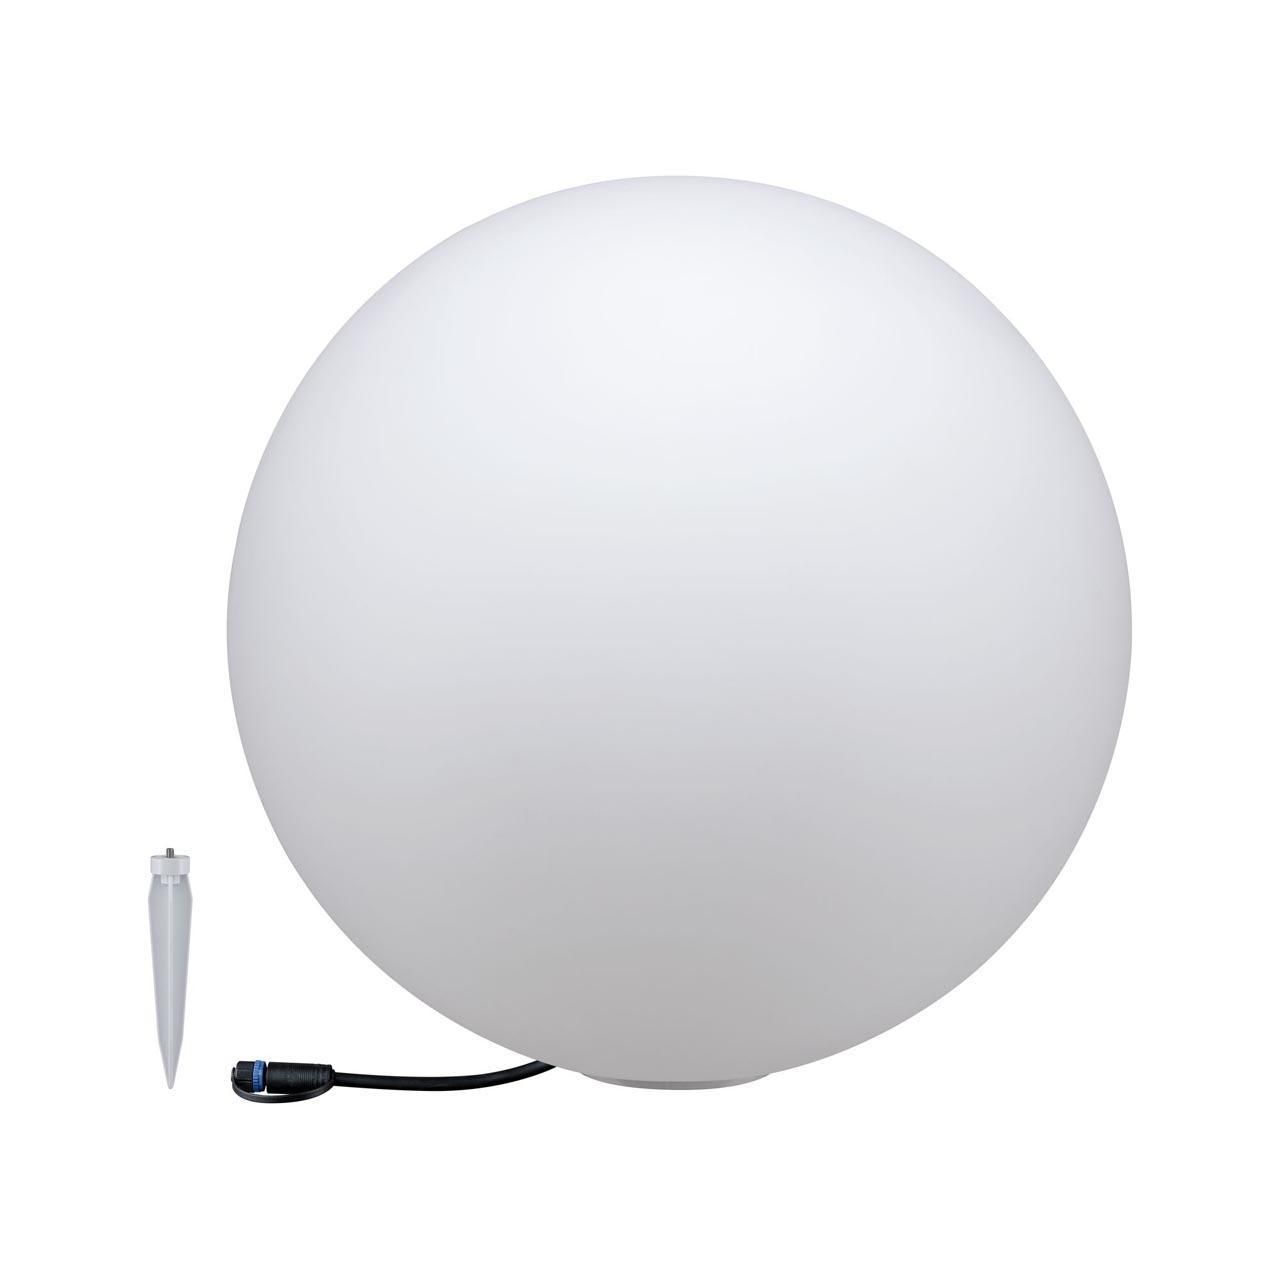 Уличный светодиодный светильник Lichtobjekt Globe